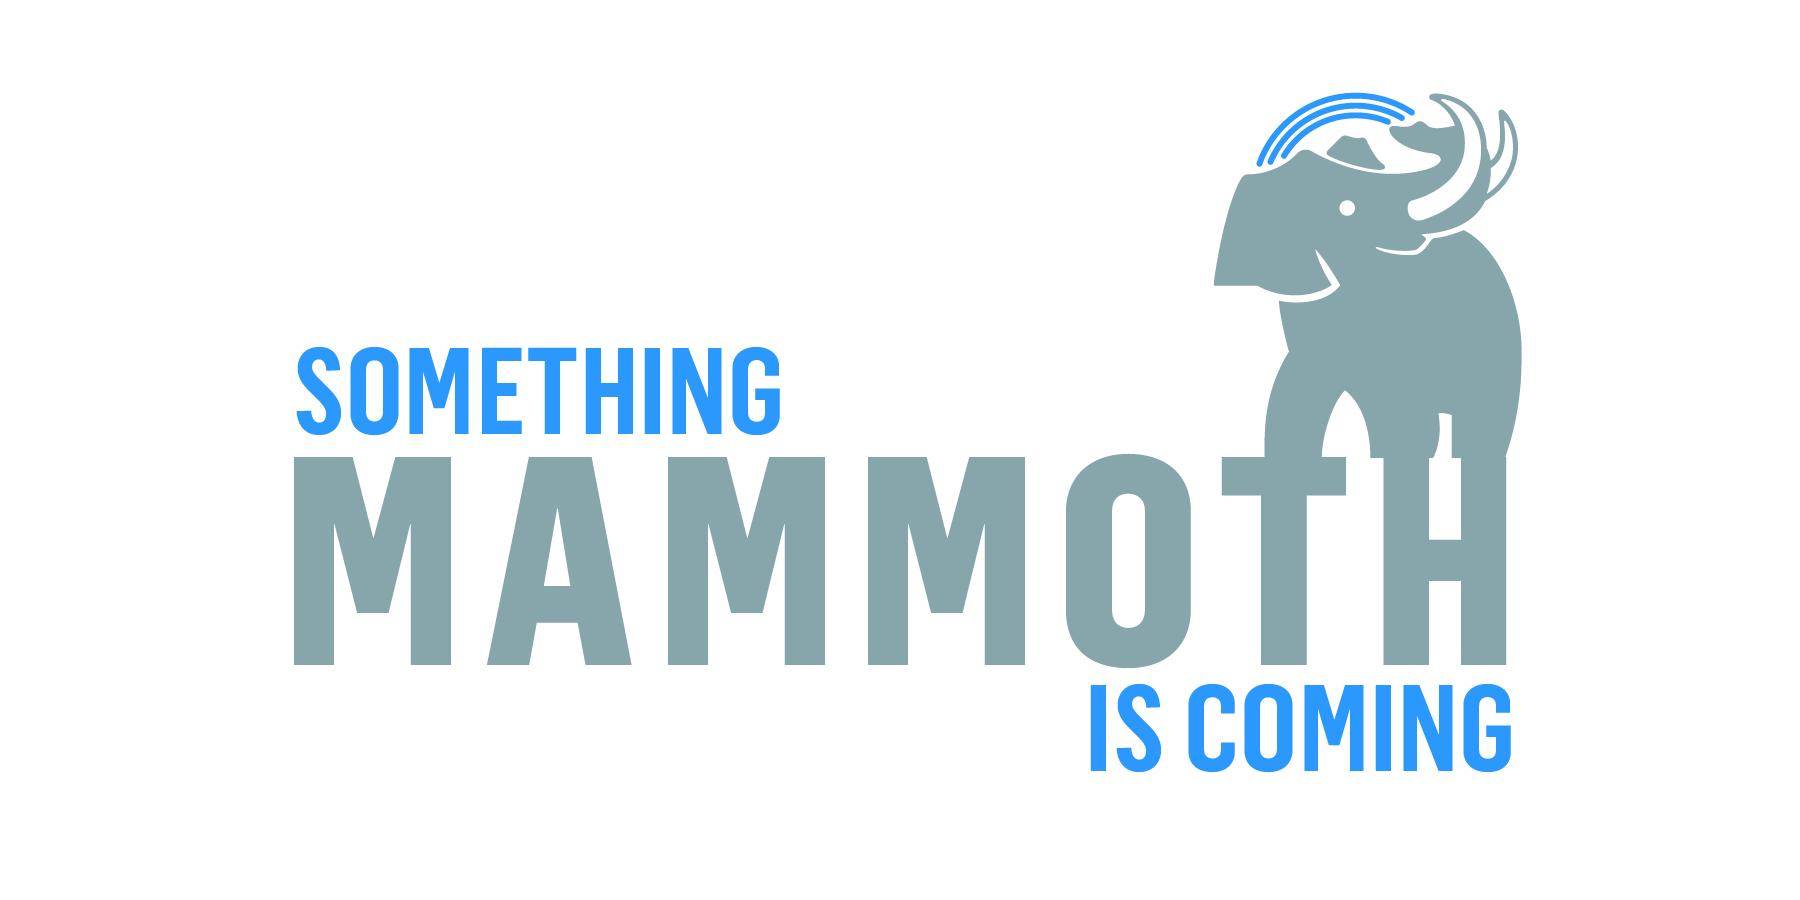 somethingmammoth